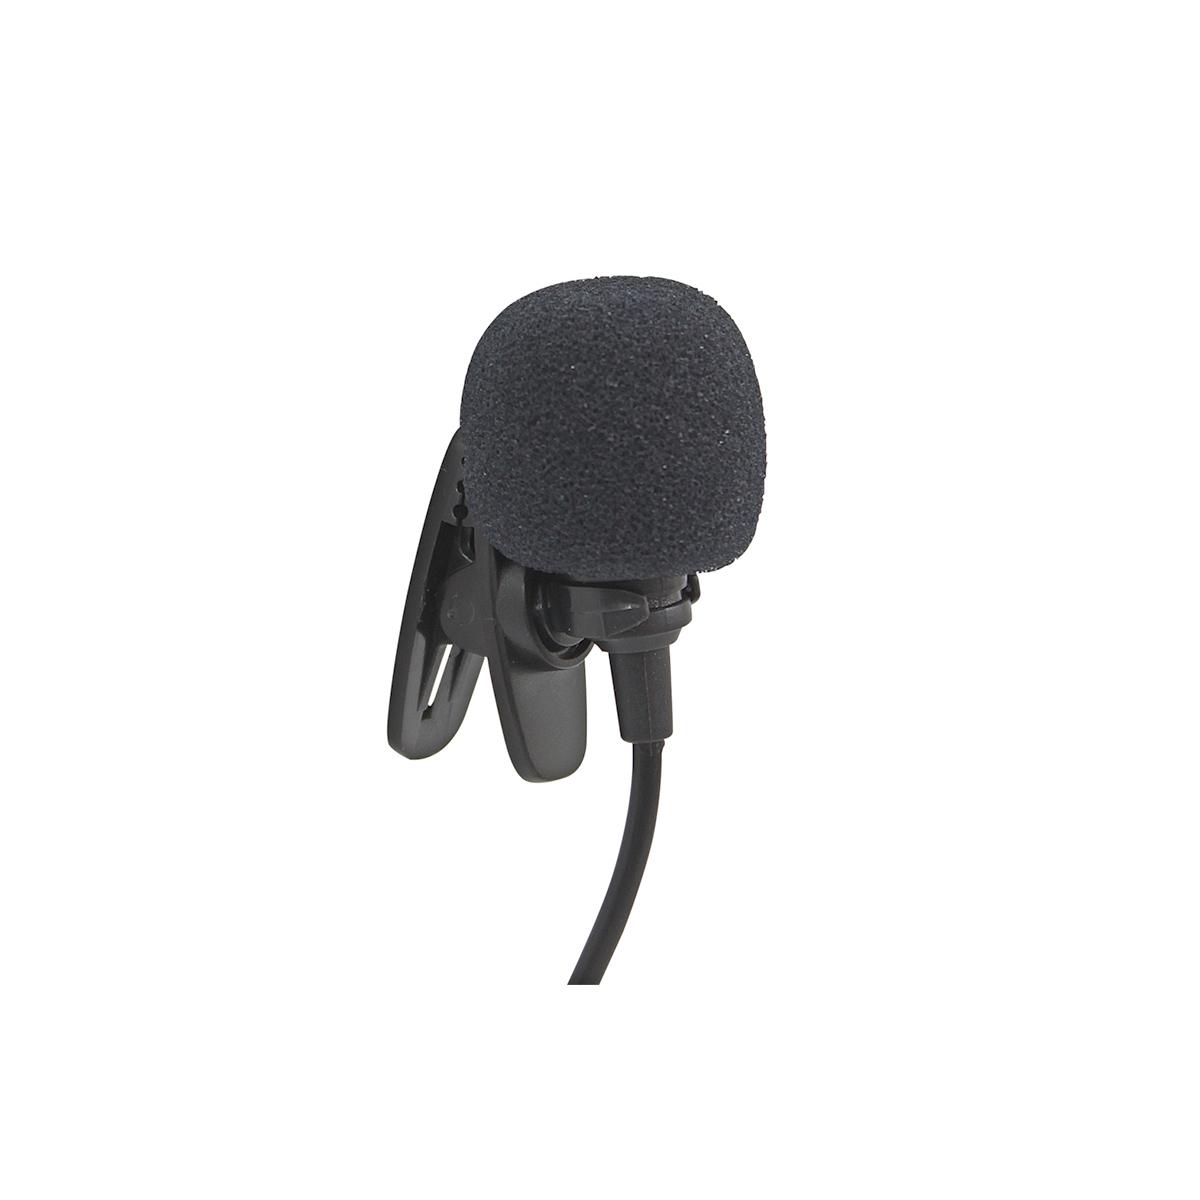 MINIIII - Microfone s/ Fio Lapela UHF MINI III - SKP